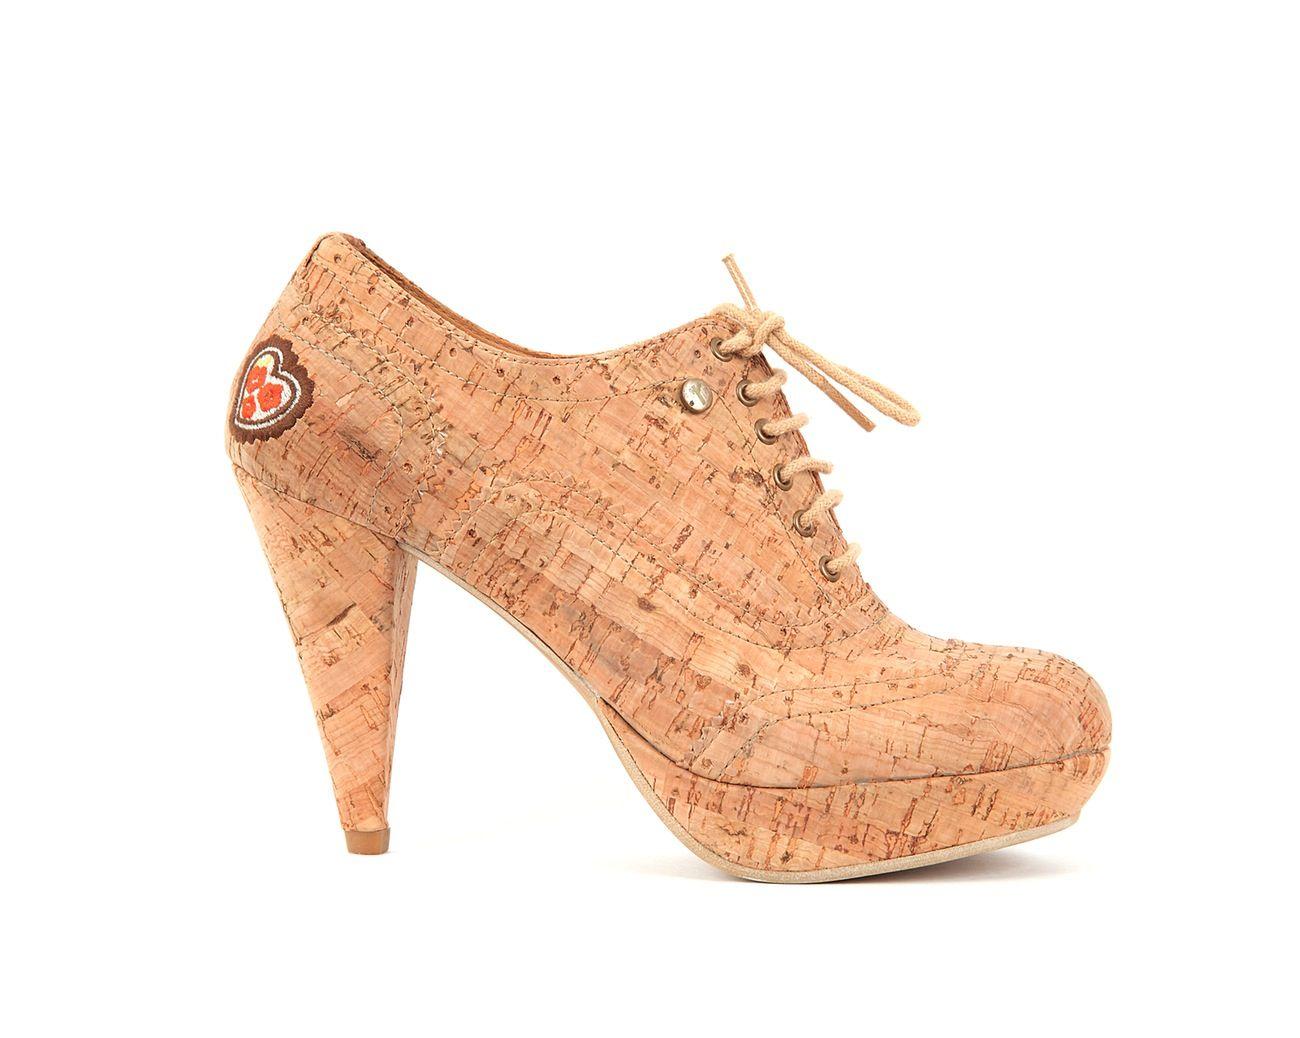 Oxford Curação   Natural  by rutz   walk in cork #cork   #shoes   #heels   #wedges   #fashion   #apparel   #portugal   #rutz   #kurk   #corcho   #boots   #botas   #ankleboots